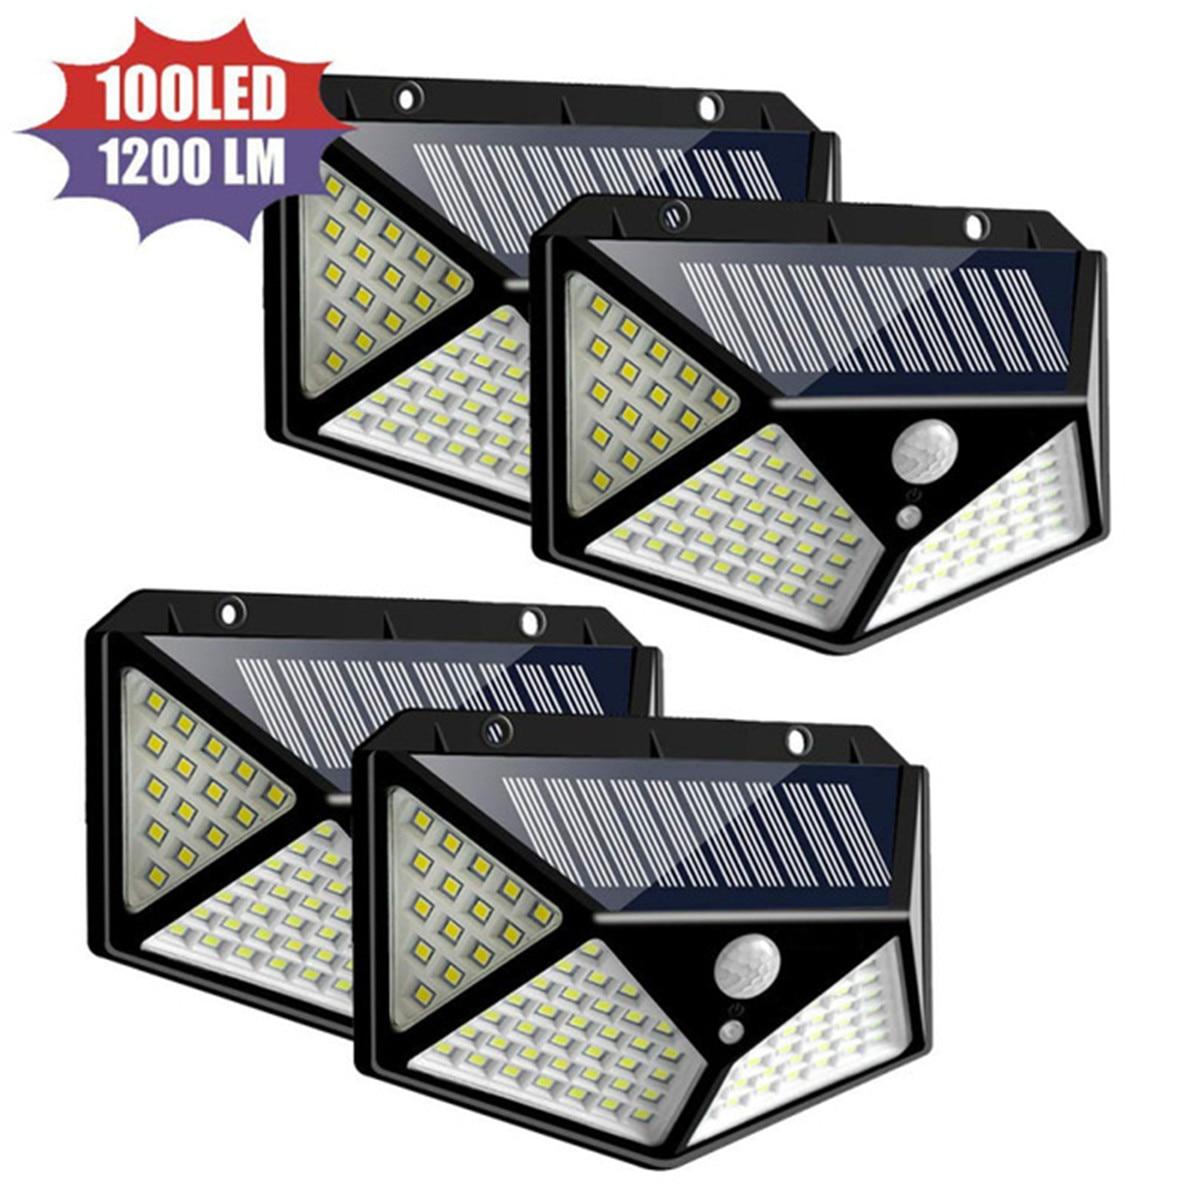 4pcs LED Solar Light Outdoor Waterproof 4-side Solar Powered Lamp 270 Degree PIR Motion Sensor Wall Light Garden Solar Light